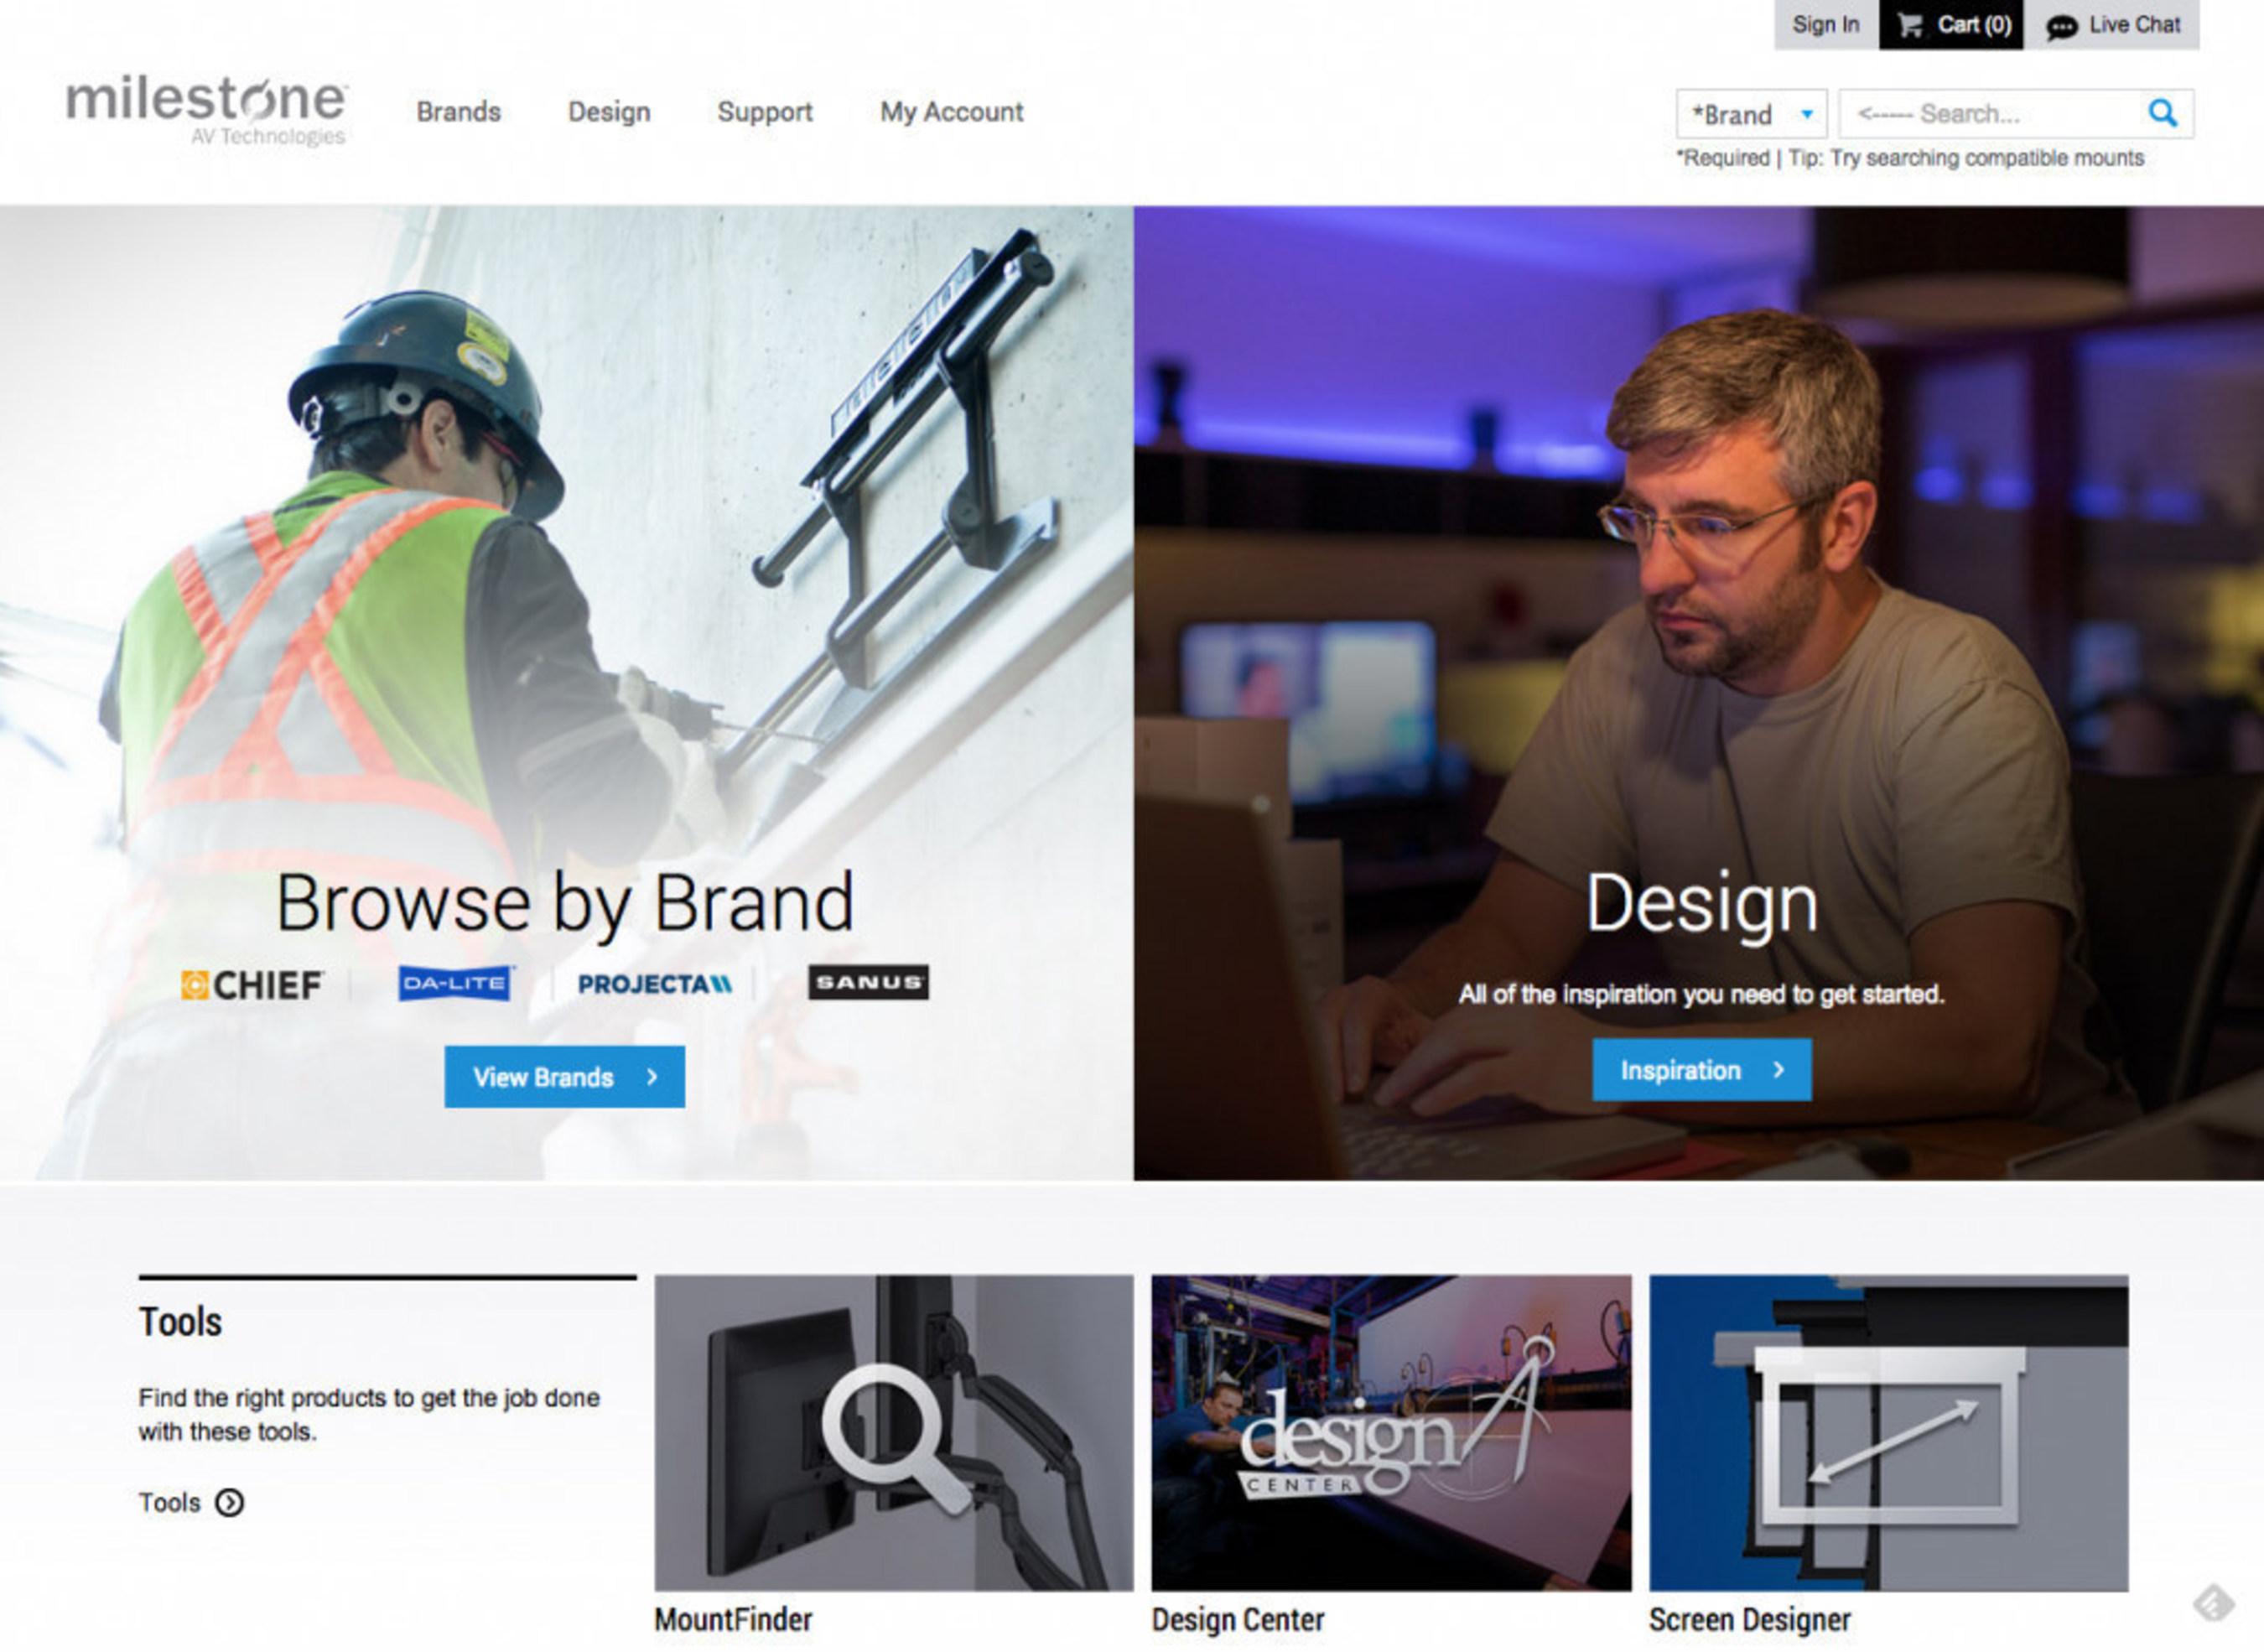 Milestone AV Technologies Launches New Website to Enhance the Customer Experience